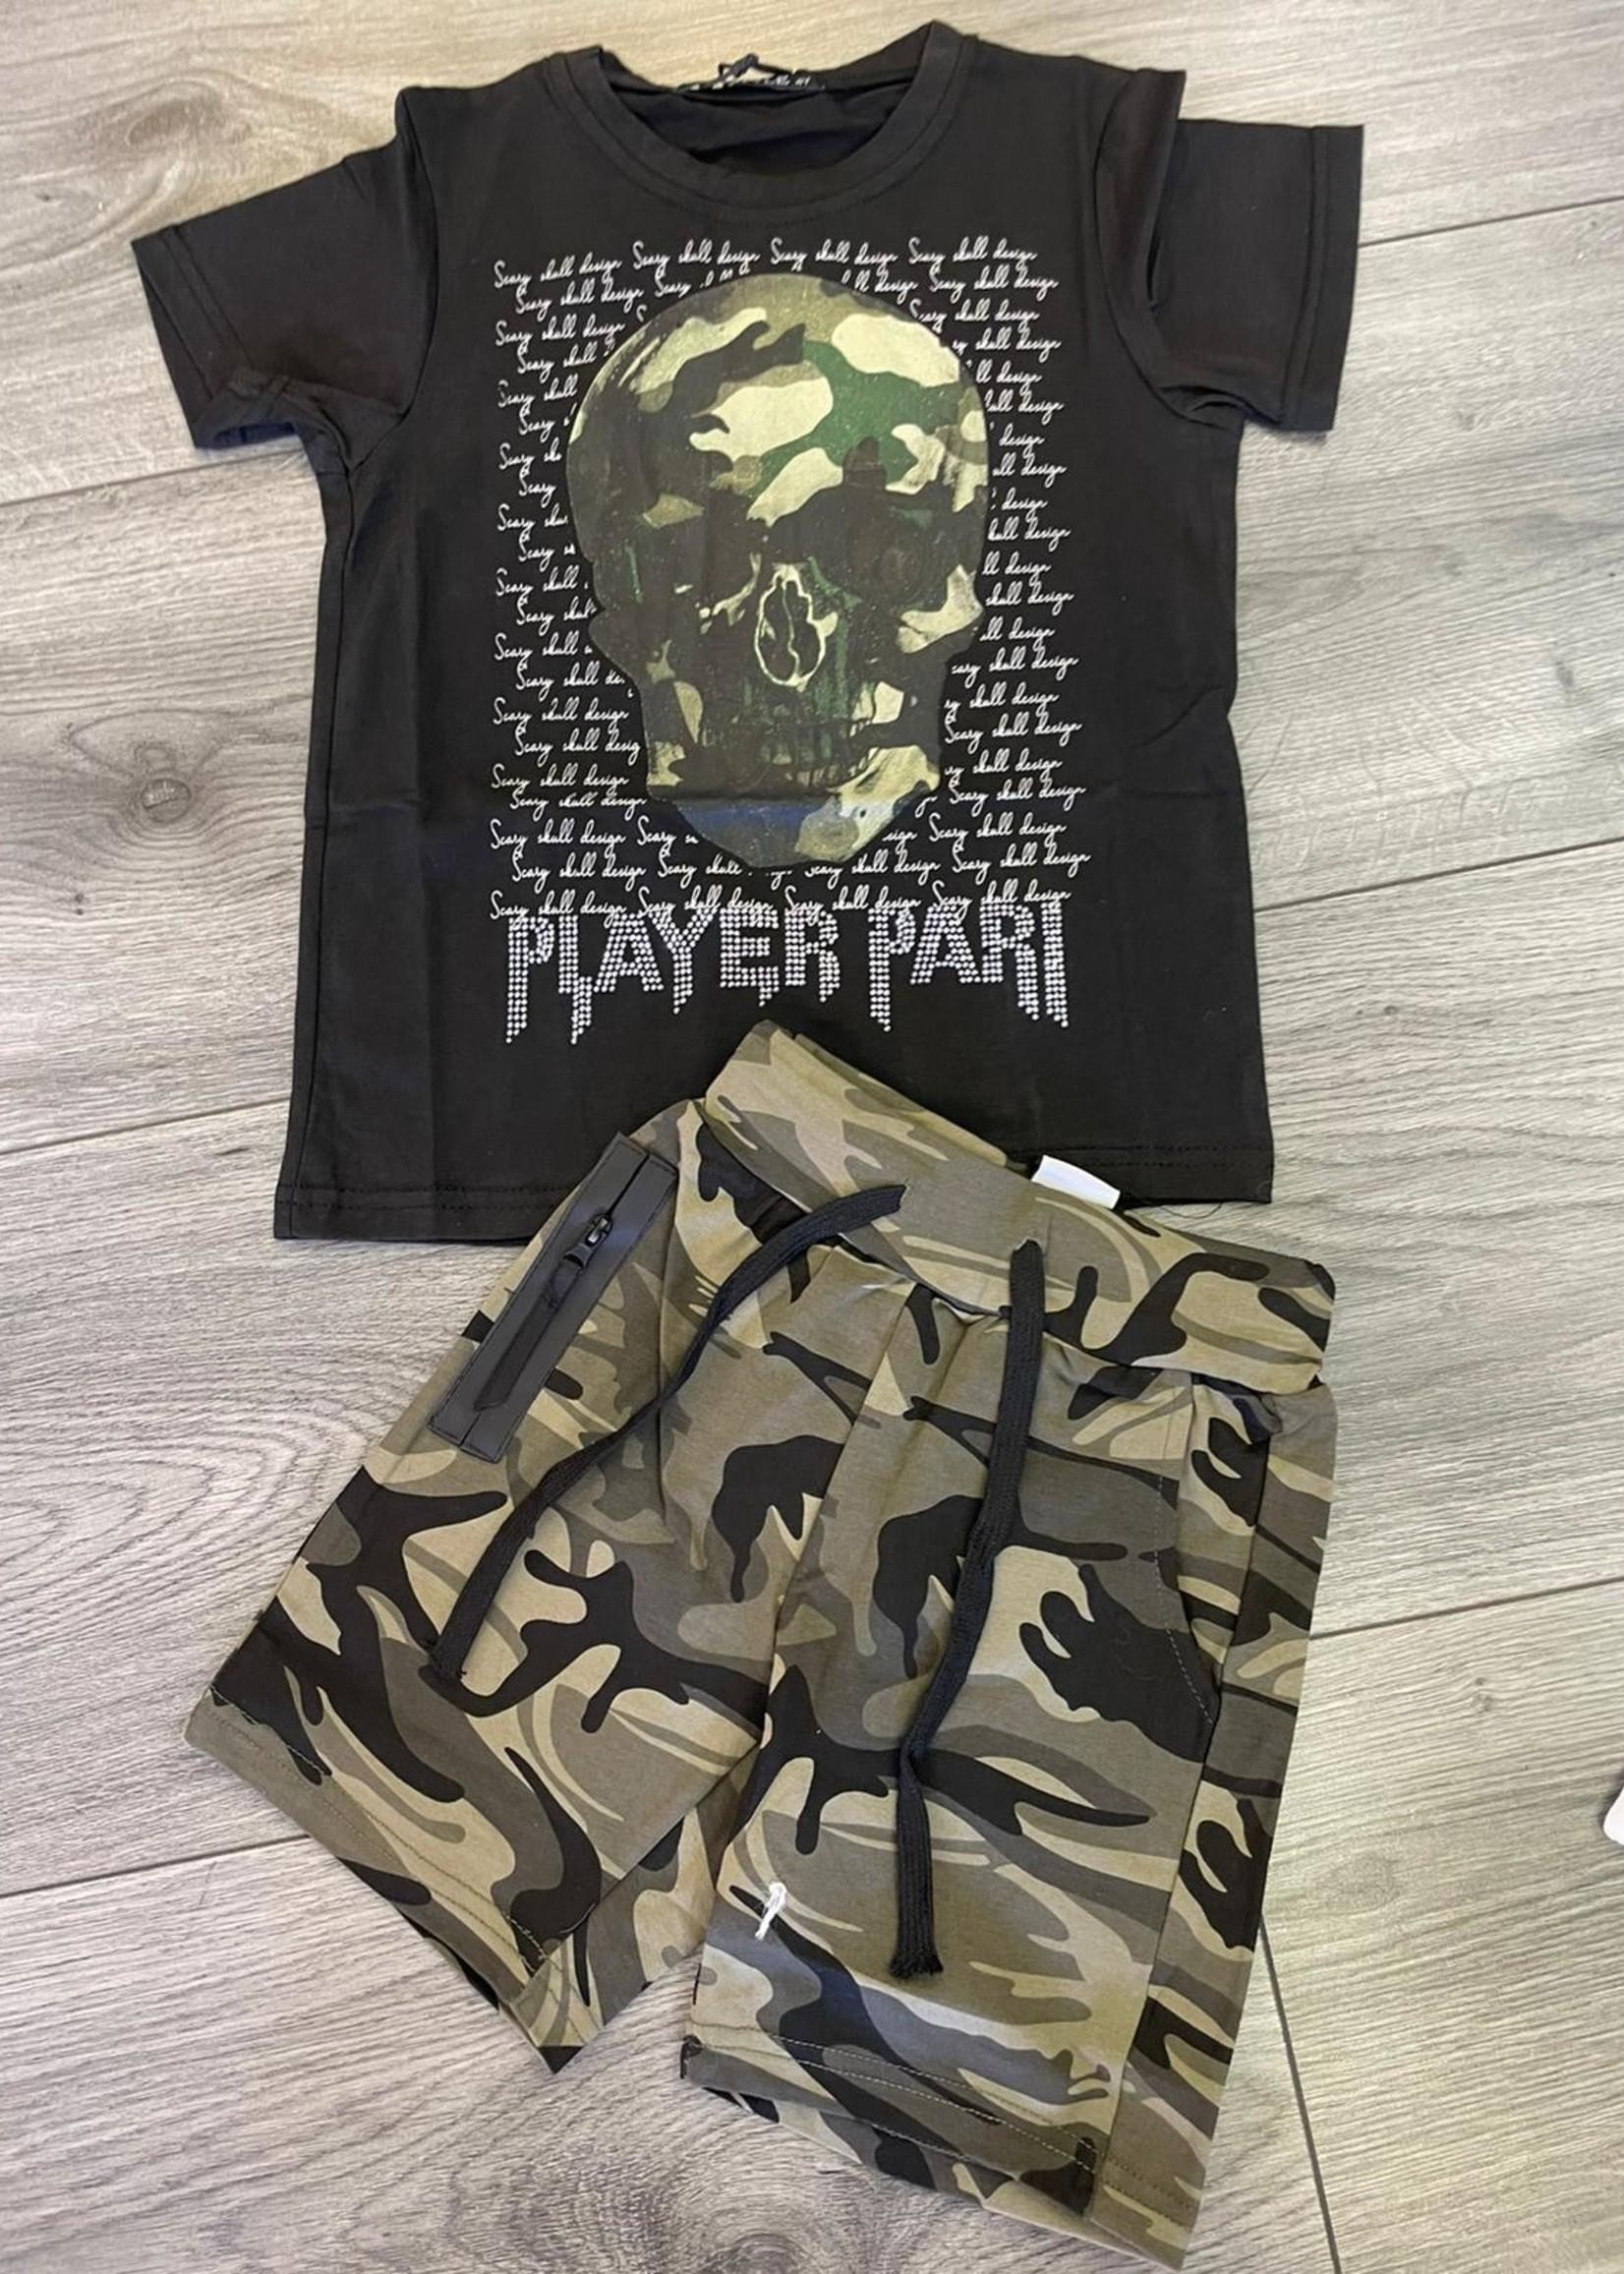 Divanis Divanis army skull tshirt black